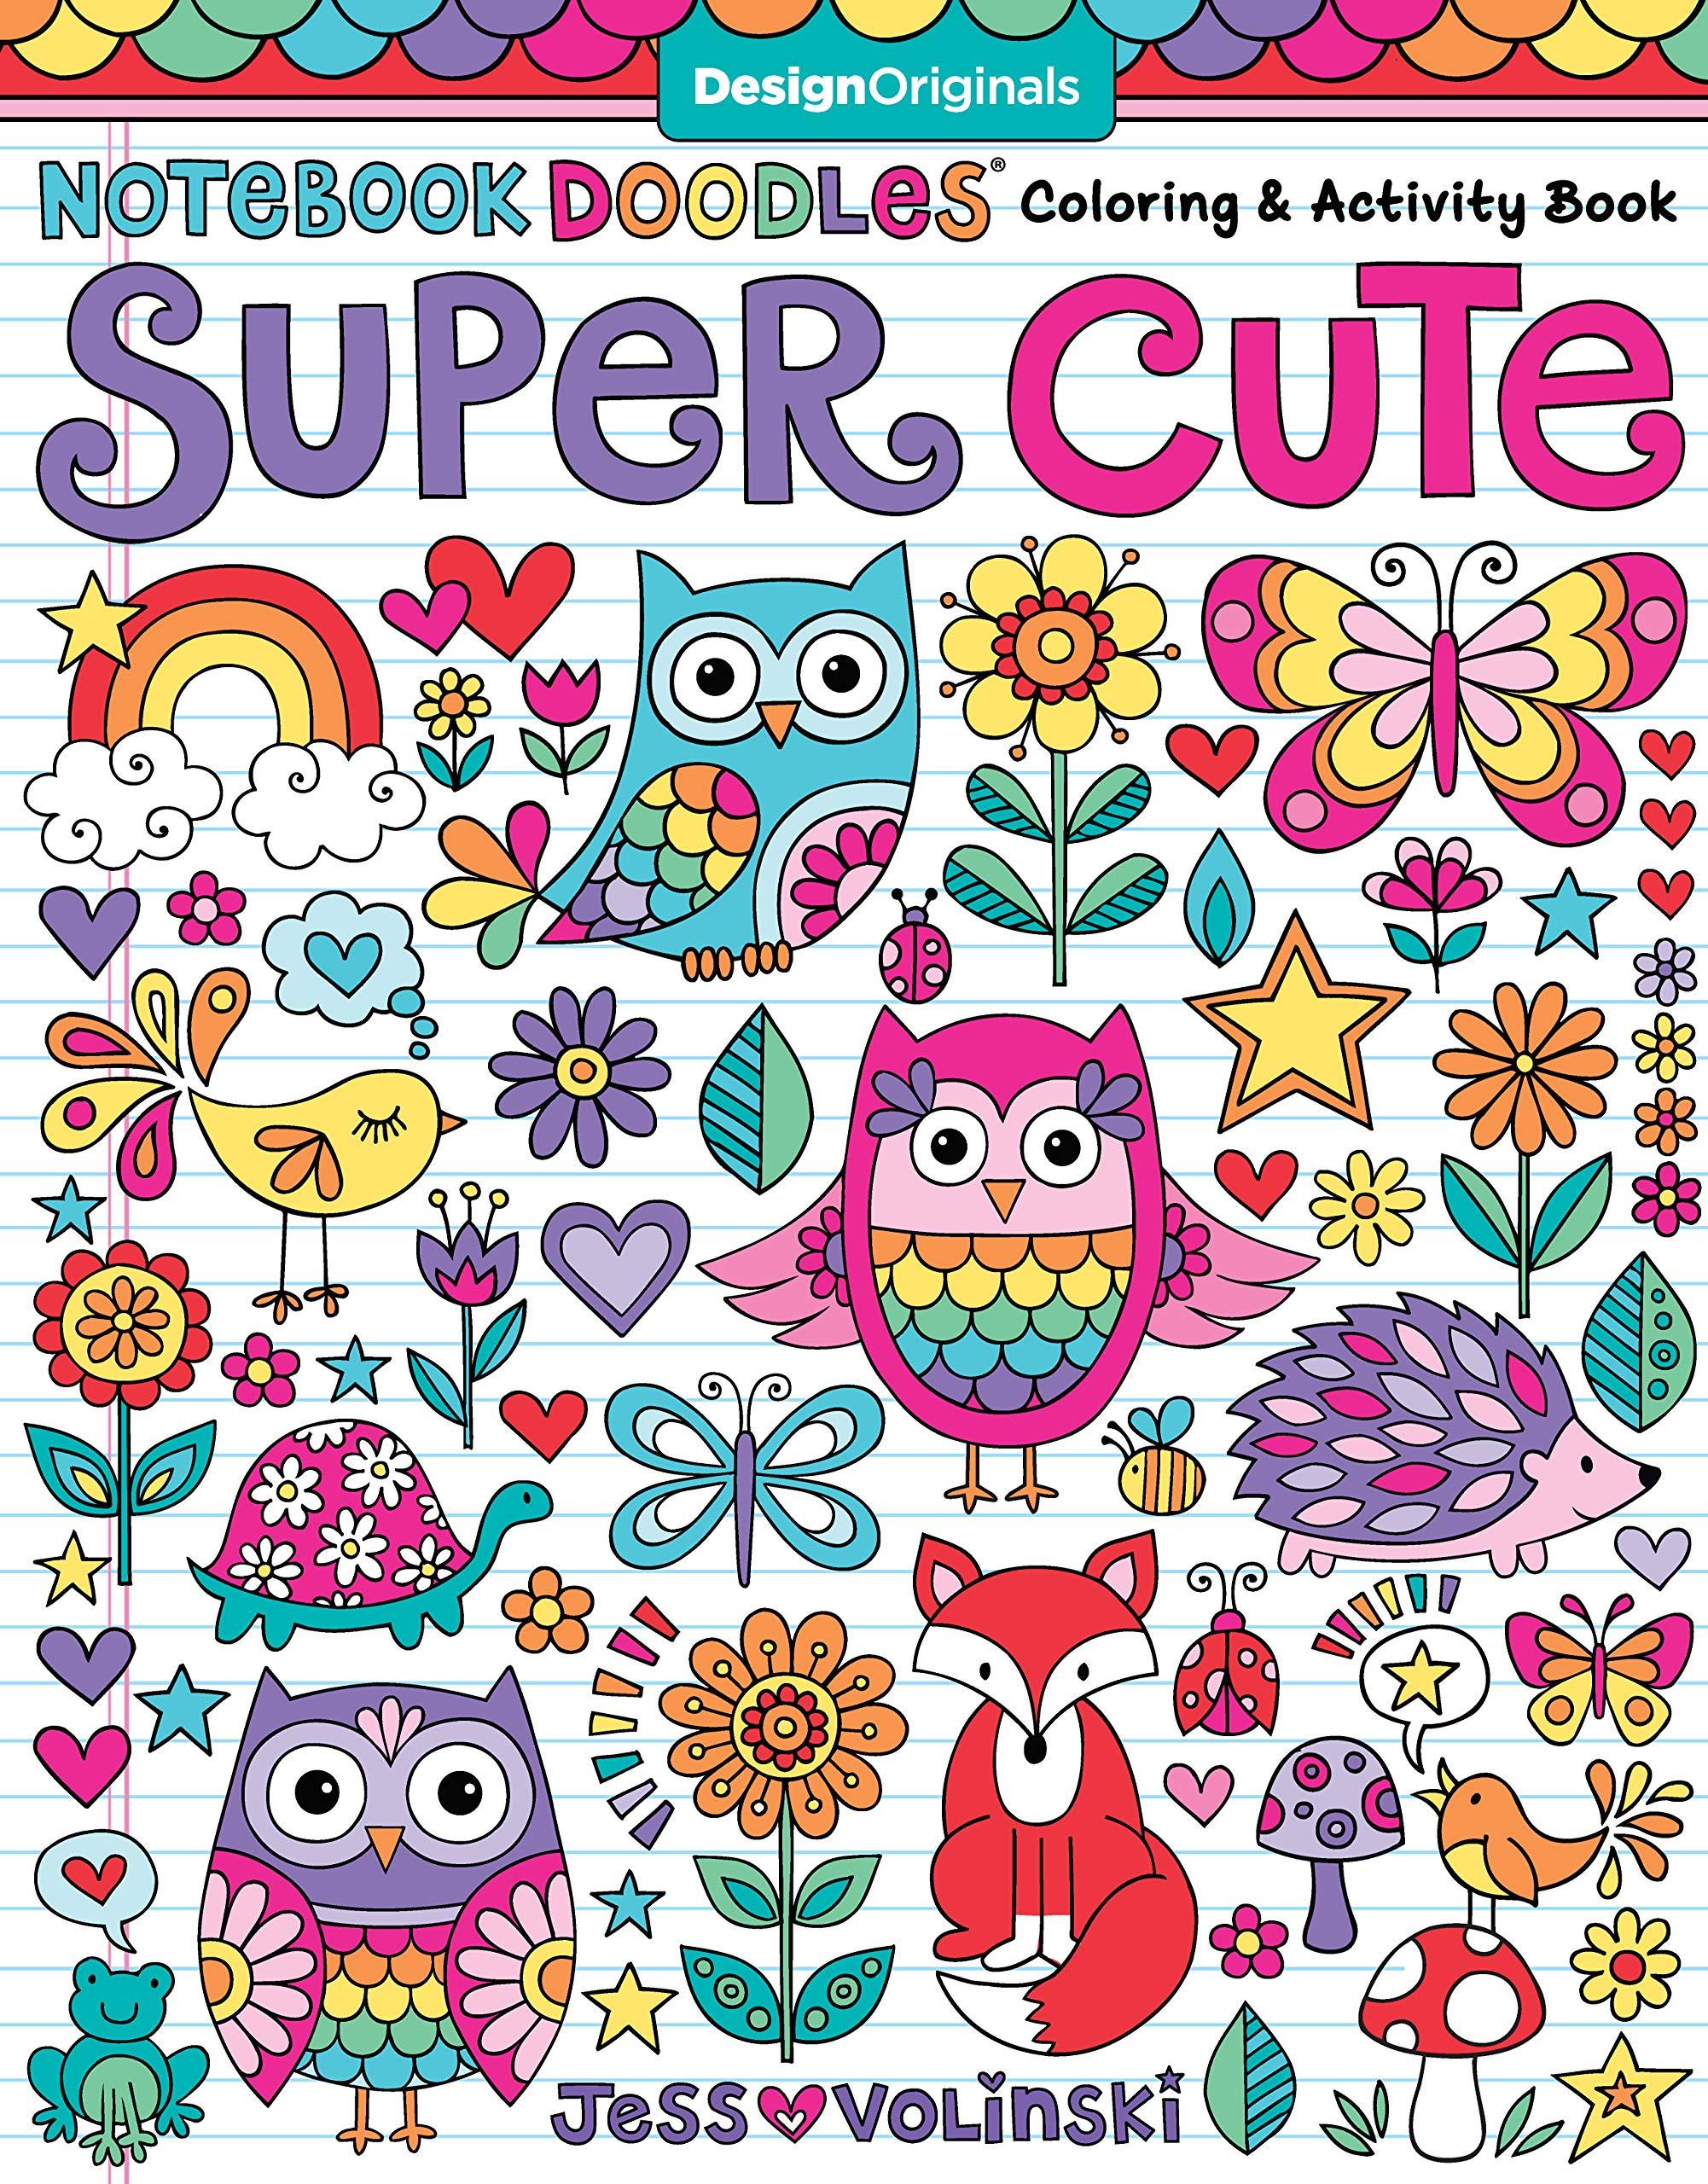 Amazon Notebook Doodles Super Cute Coloring Activity Book Design Originals 32 Adorable Animal Designs Beginner Friendly Relaxing Creative Art